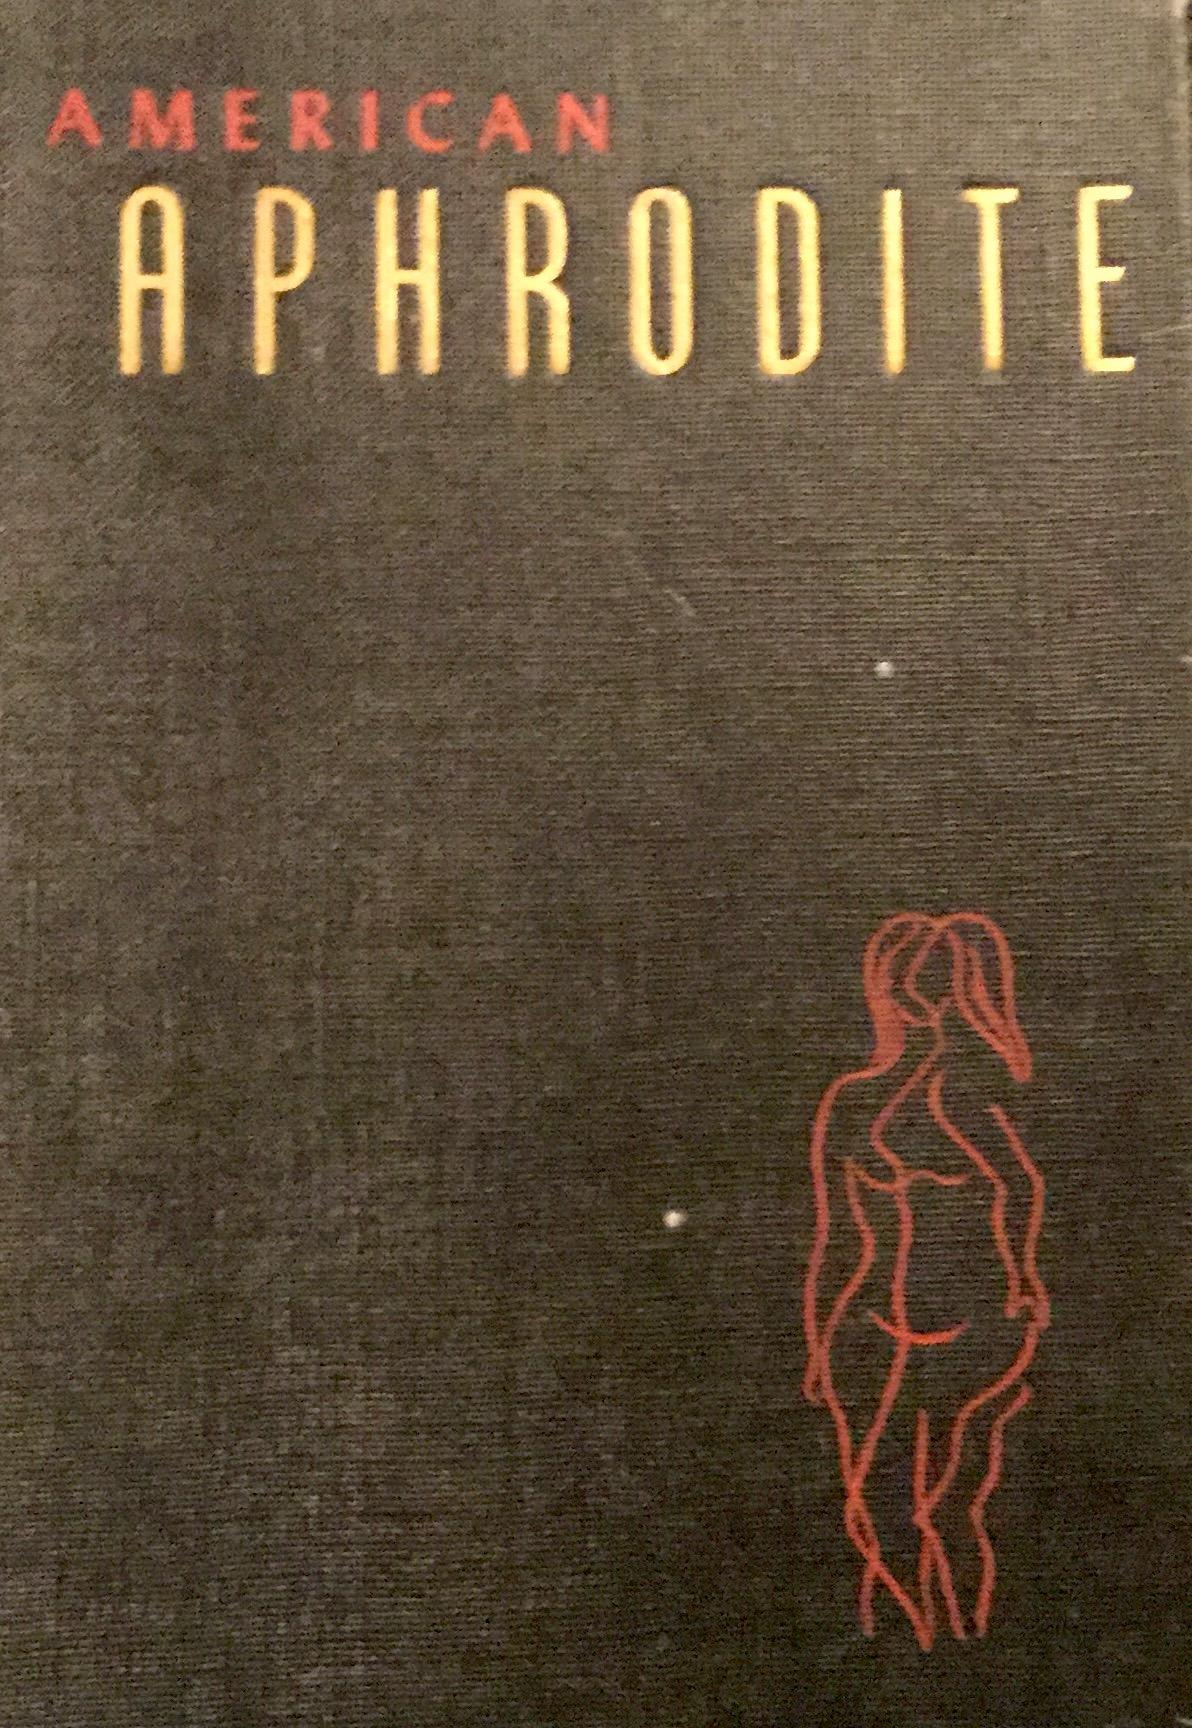 American Aphrodite